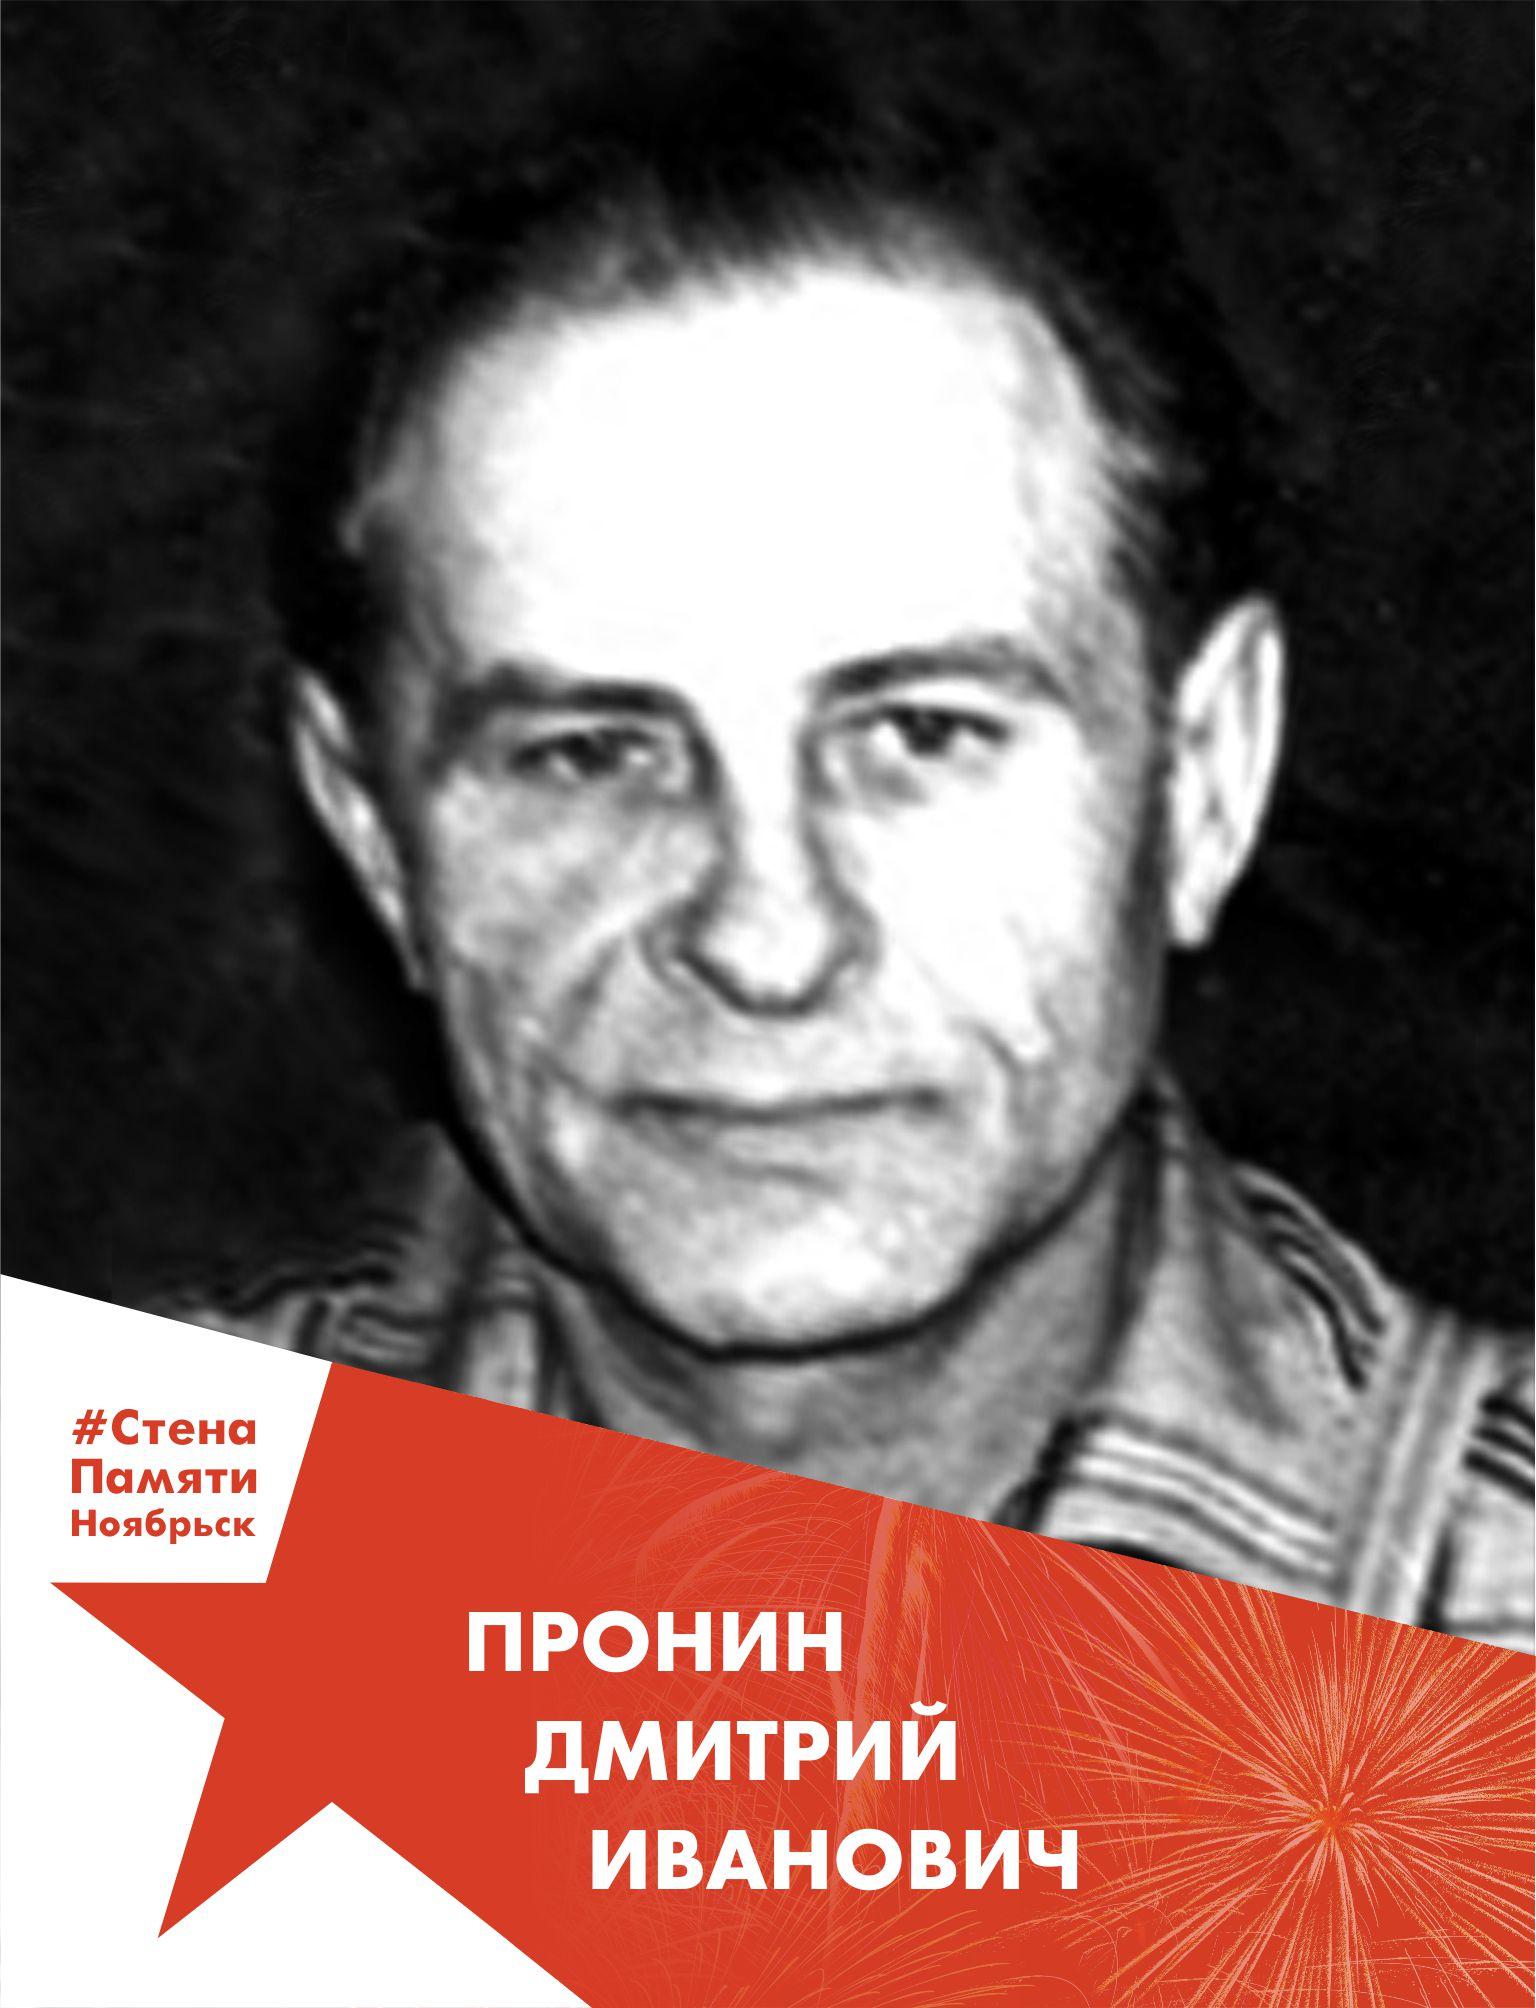 Пронин Дмитрий Иванович